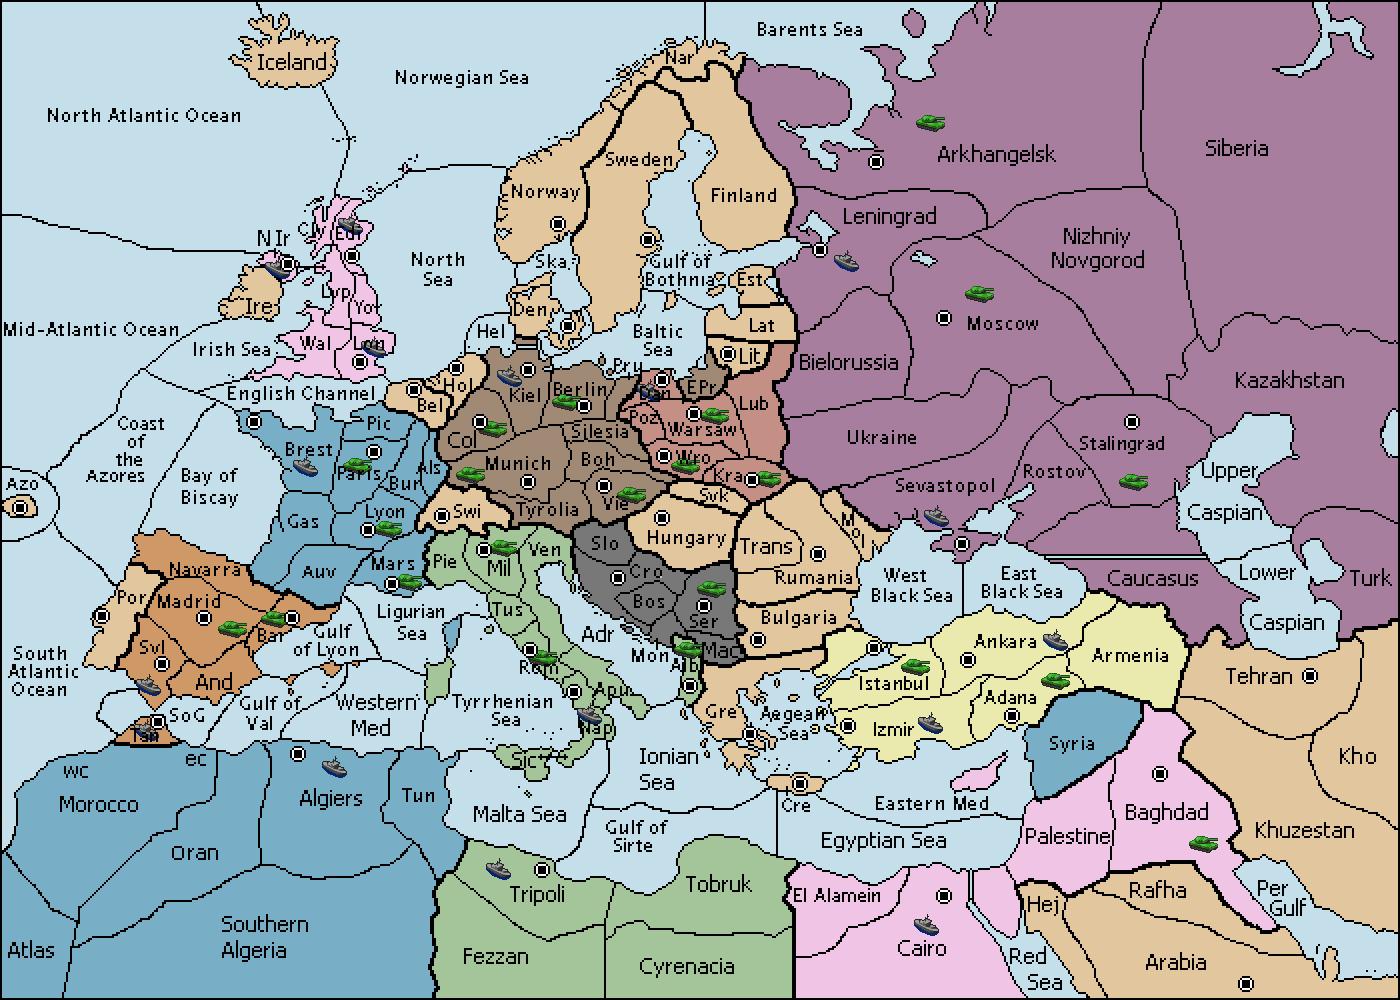 Variants vDiplomacy